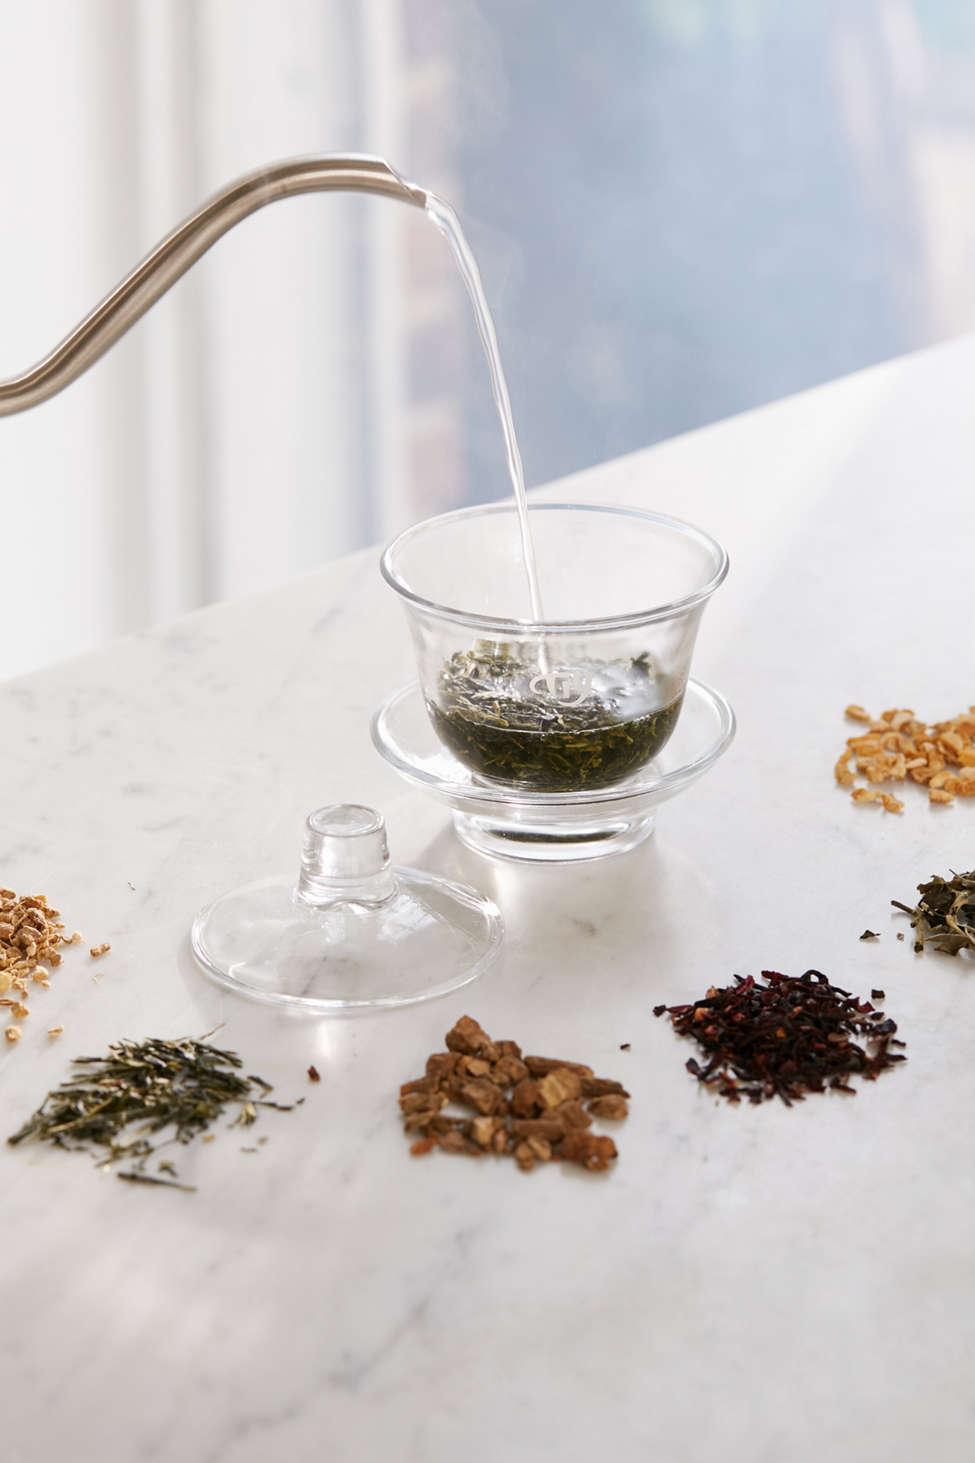 Slide View: 2: Make-Your-Own Detox Tea + Gaiwan Kit